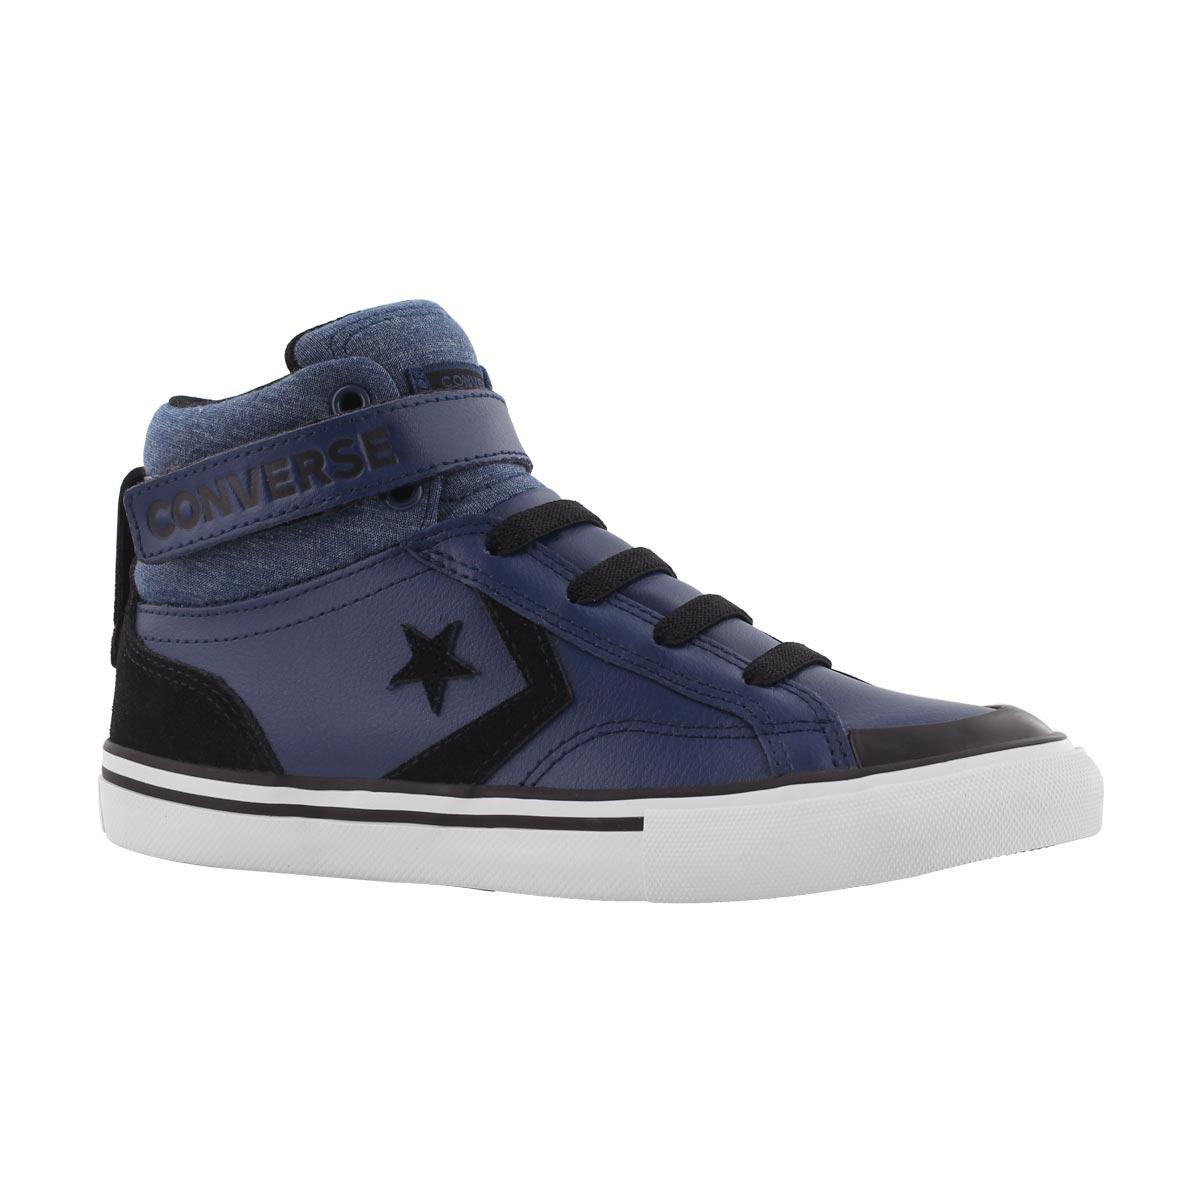 Boys PRO BLAZE STRAP navy hi top sneaker